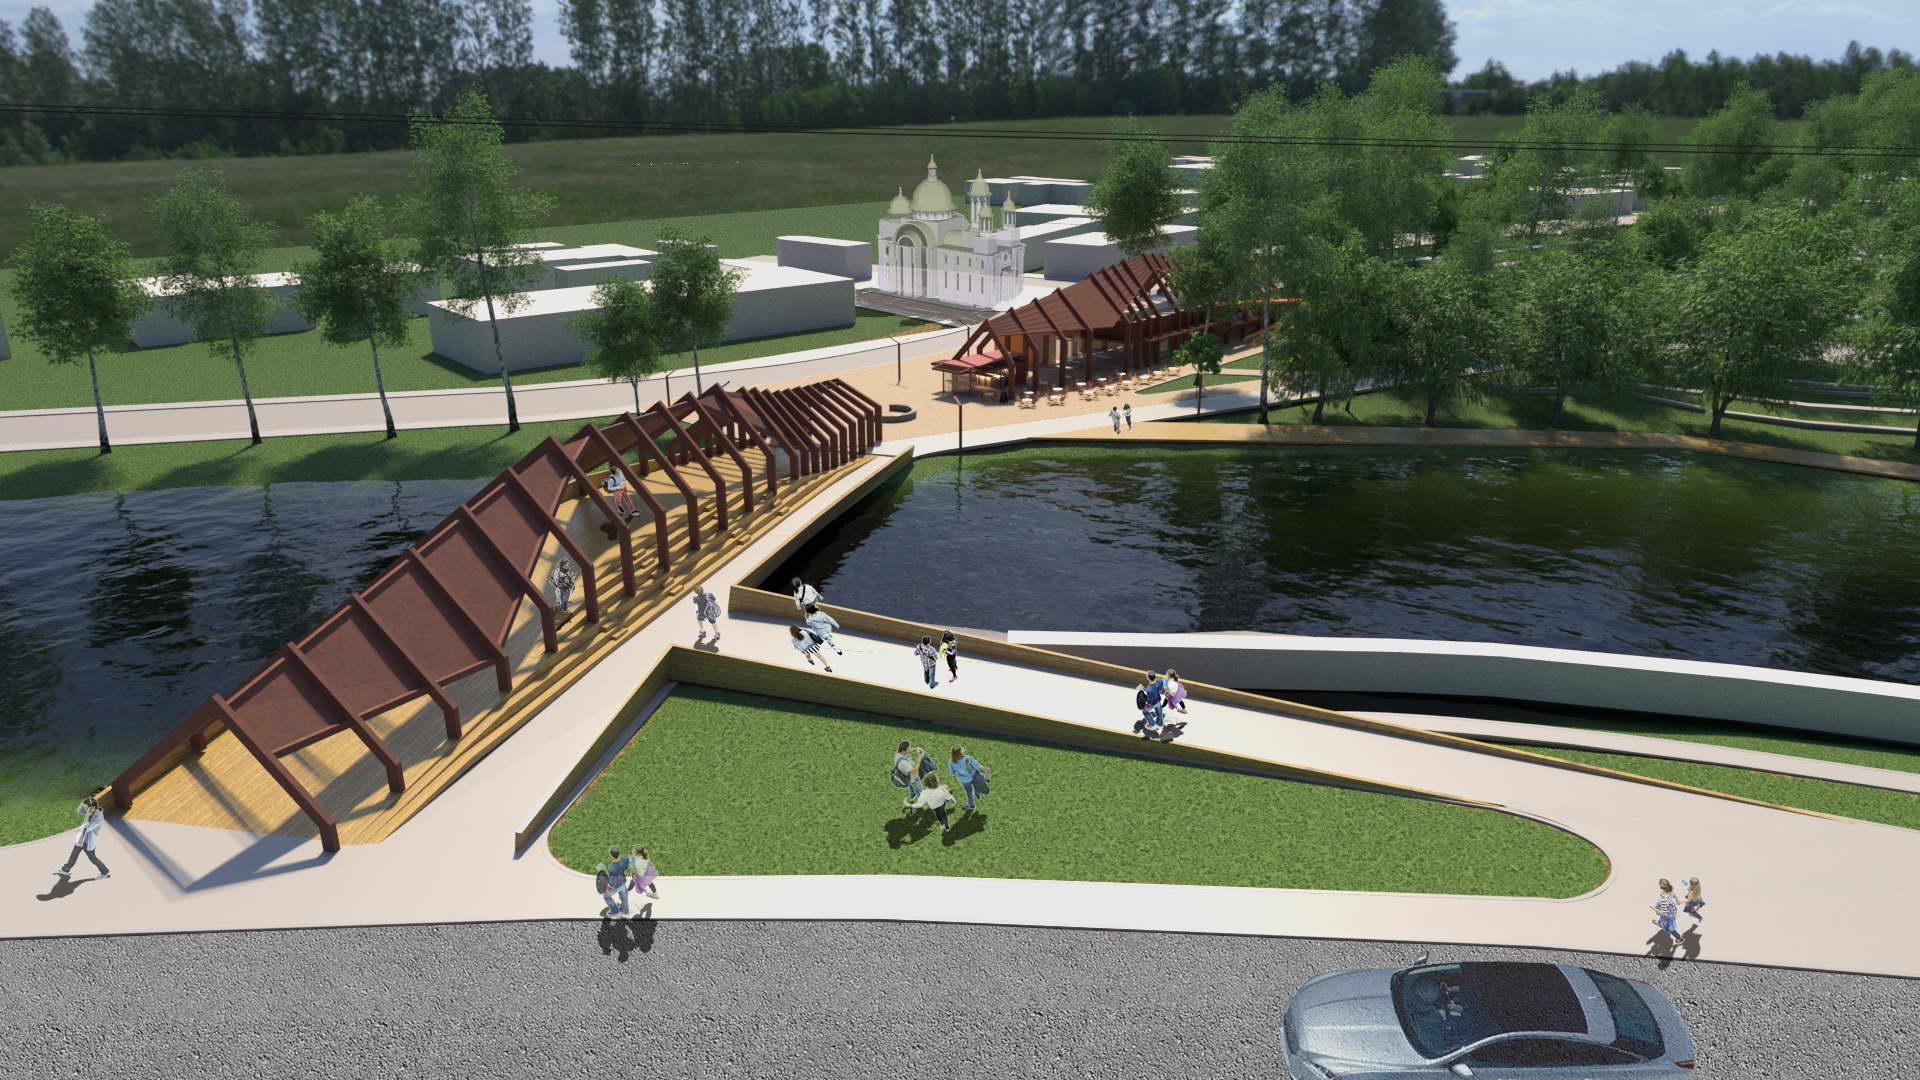 https://nbc-arhitect.ro/wp-content/uploads/2020/10/NBC-Arhitect-_-contests-_-Kinetik-Park-_-Cluj-Napoca-Romania_7.jpg